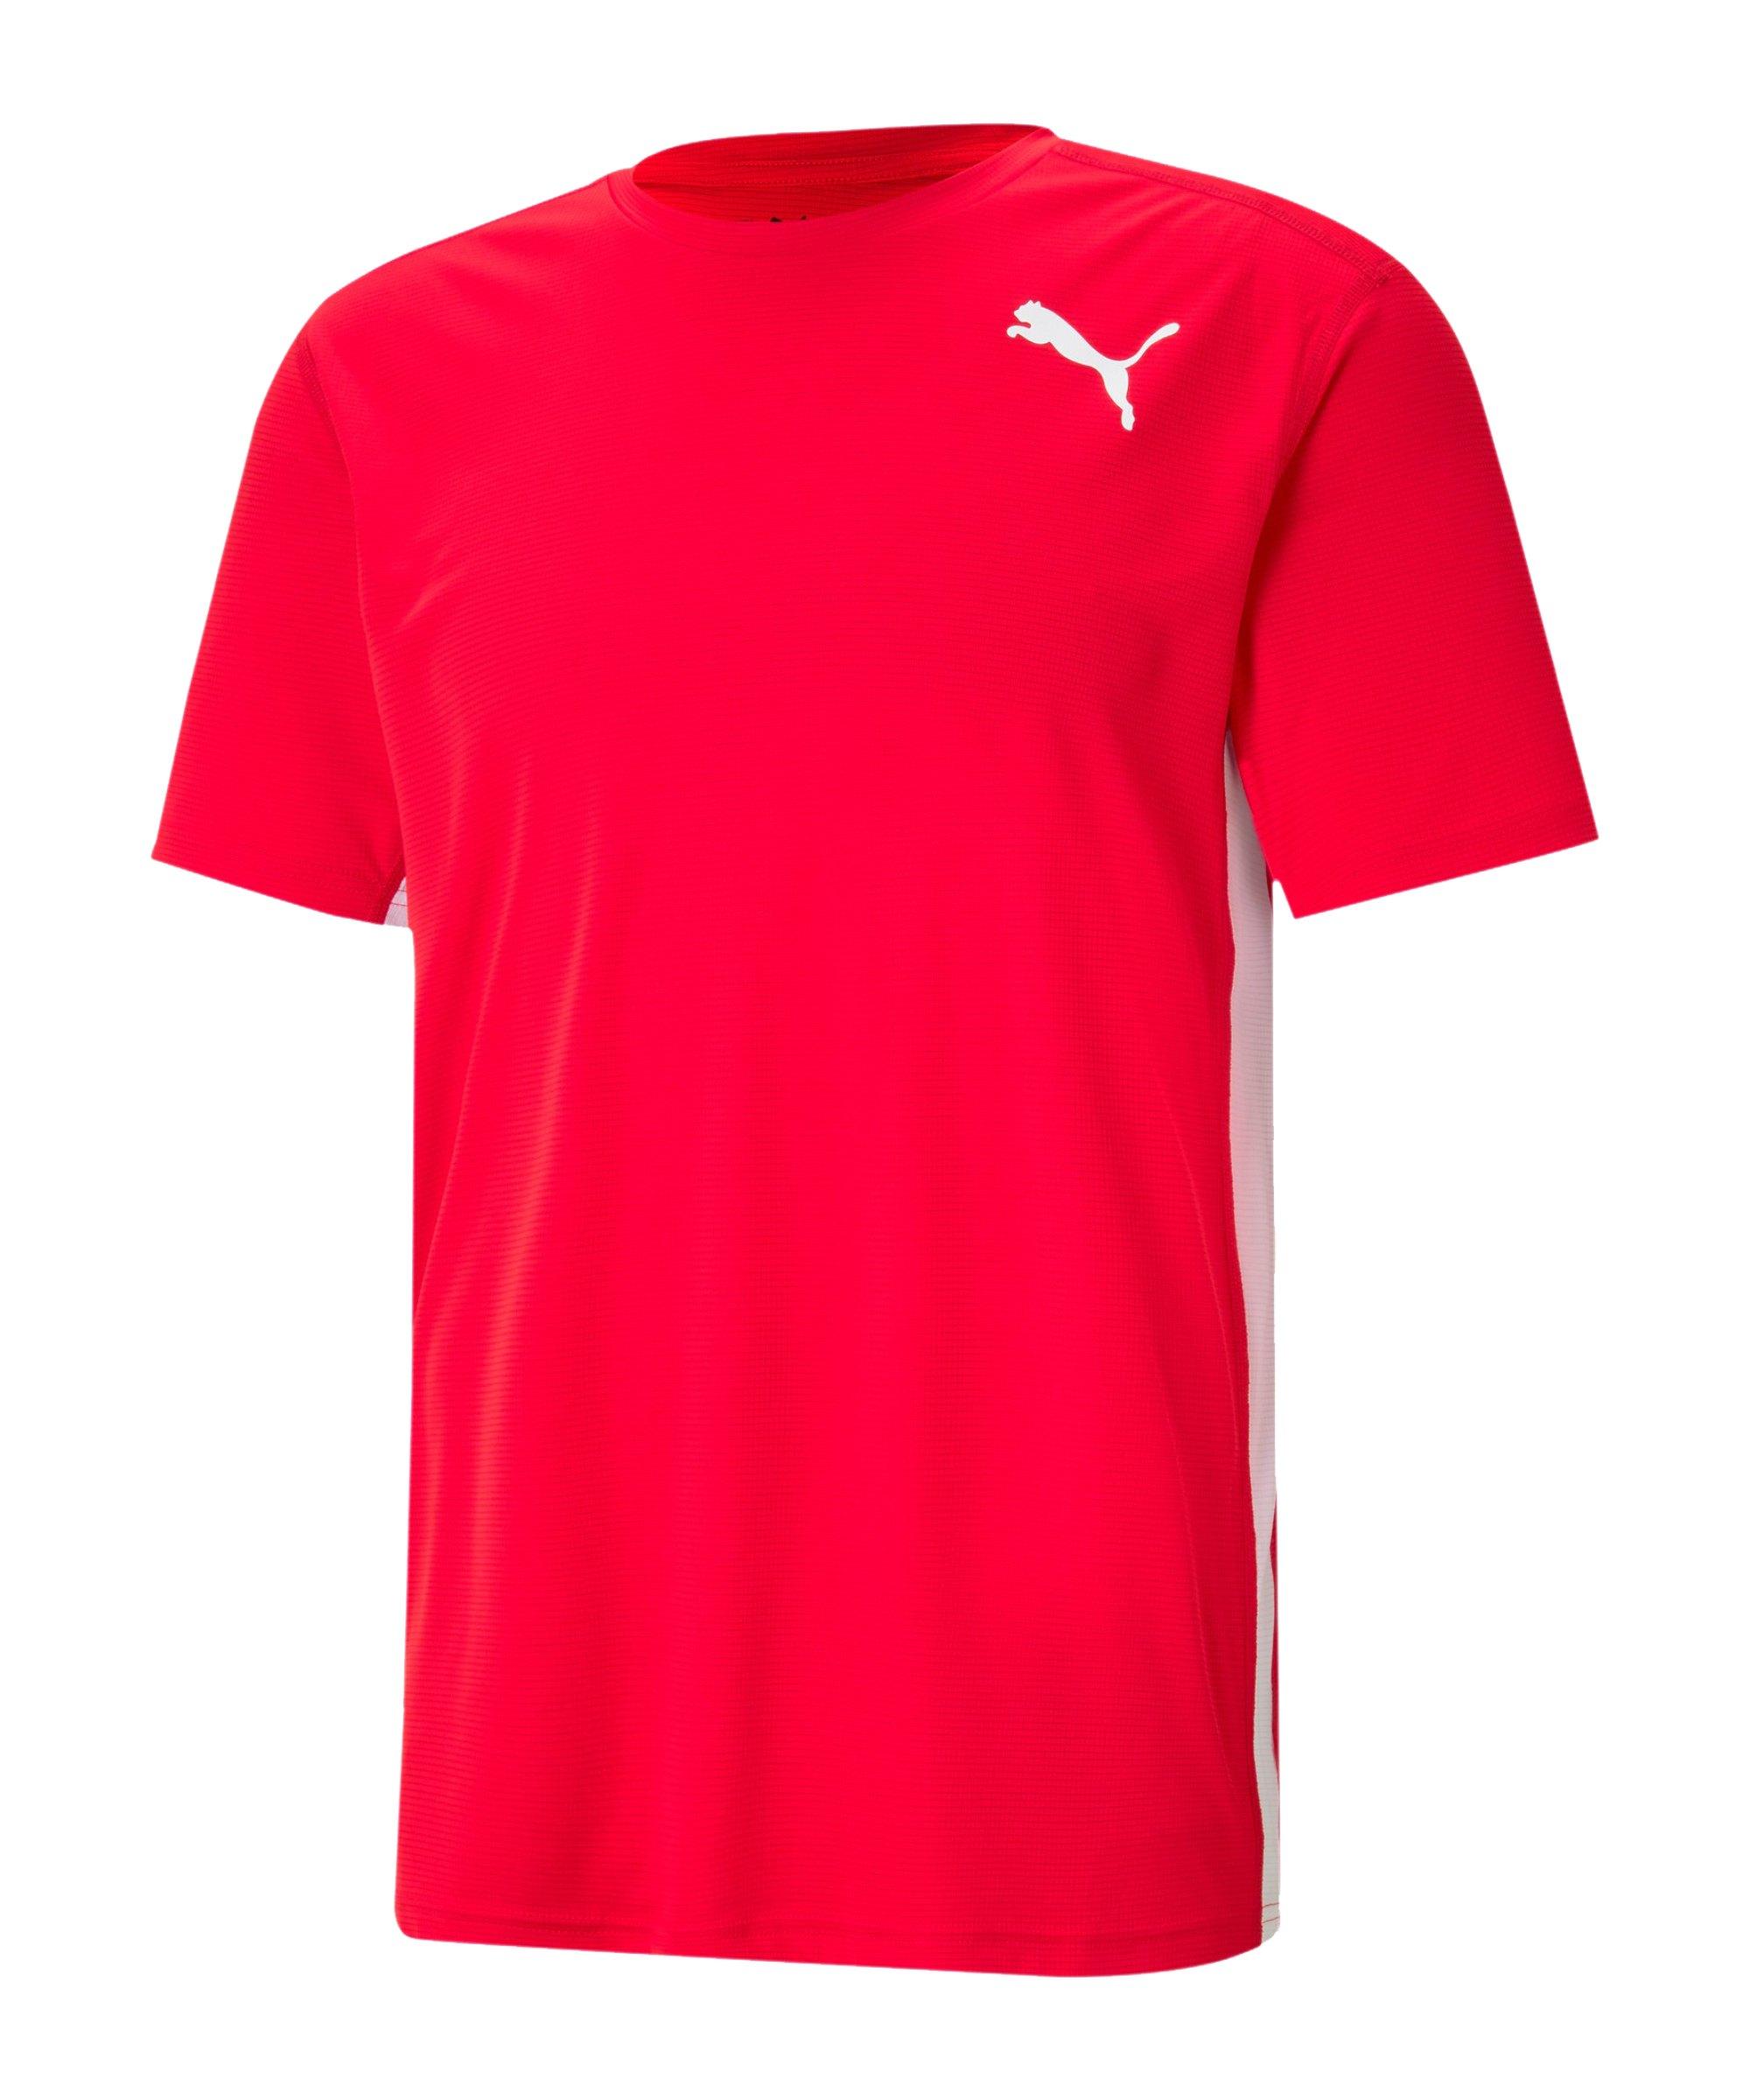 PUMA Cross the Line 2.0 T-Shirt Rot Weiss F05 - rot